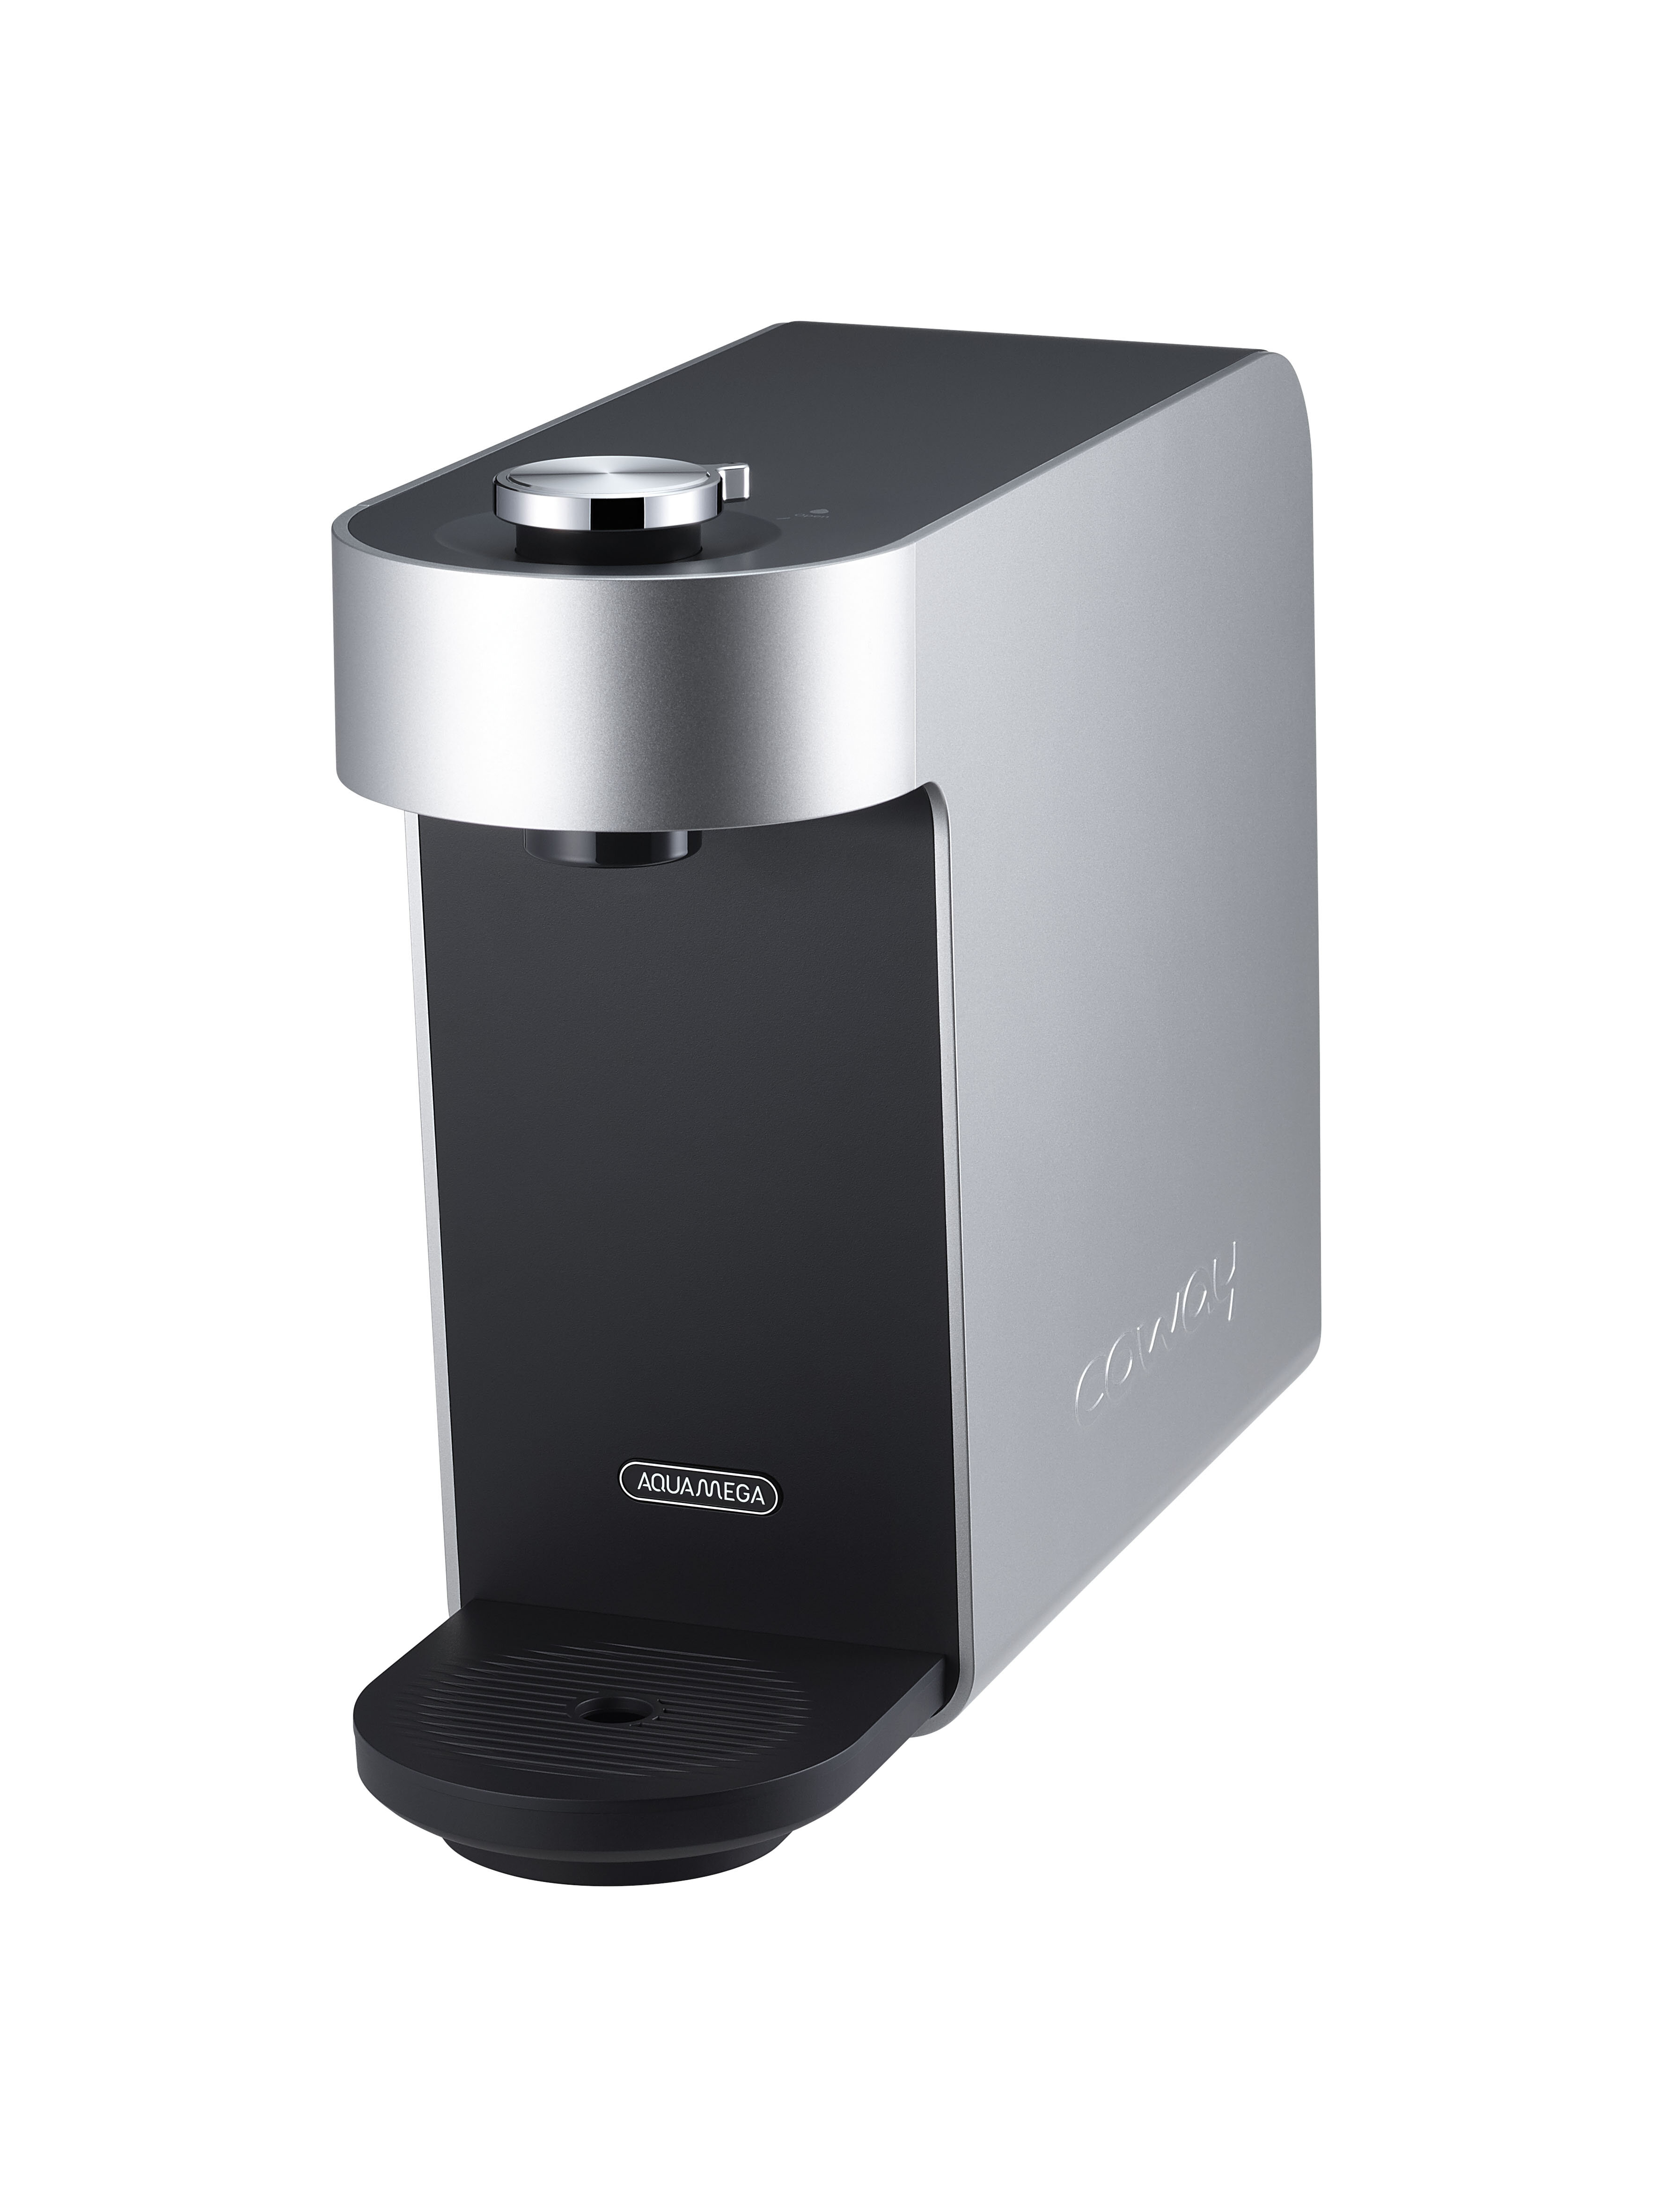 Aquamega Coway 100 Water Purifier   Wayfair